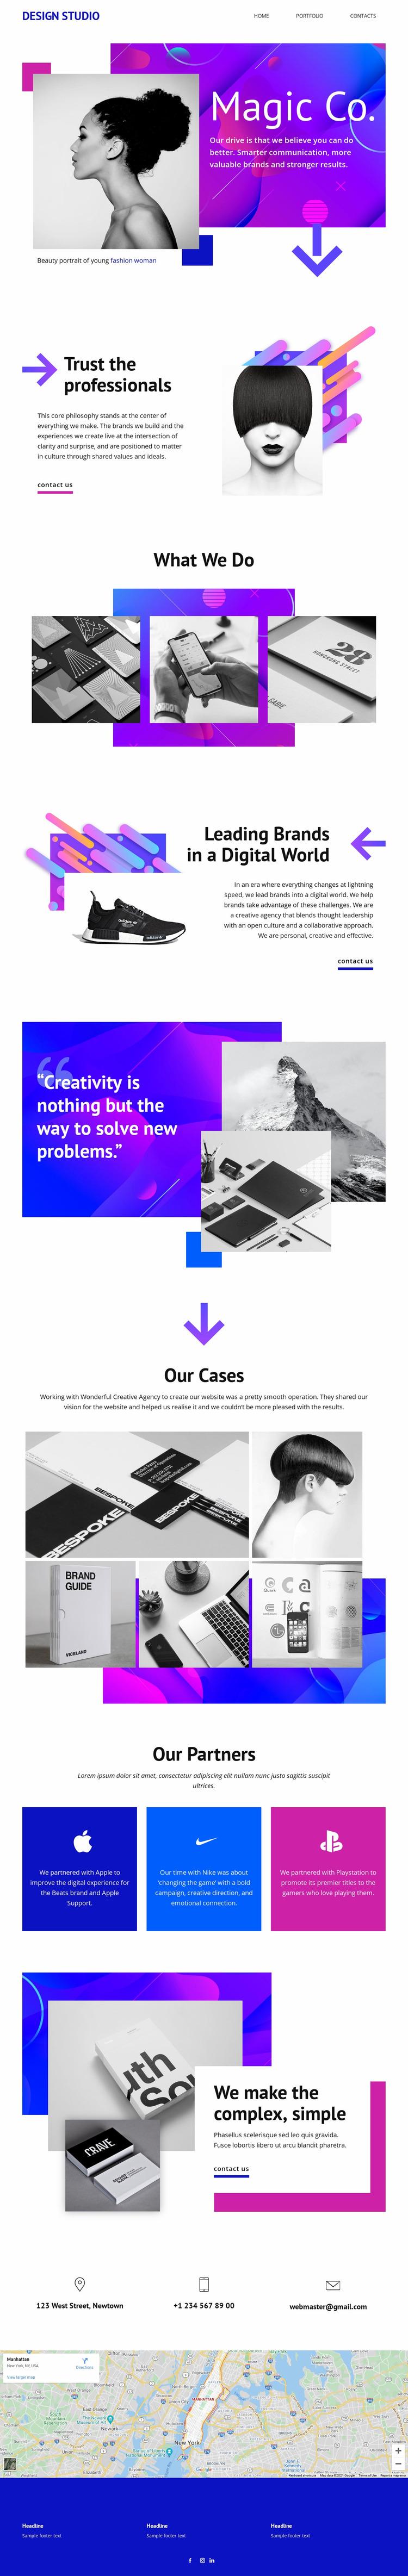 Magic Creative Studio Website Mockup